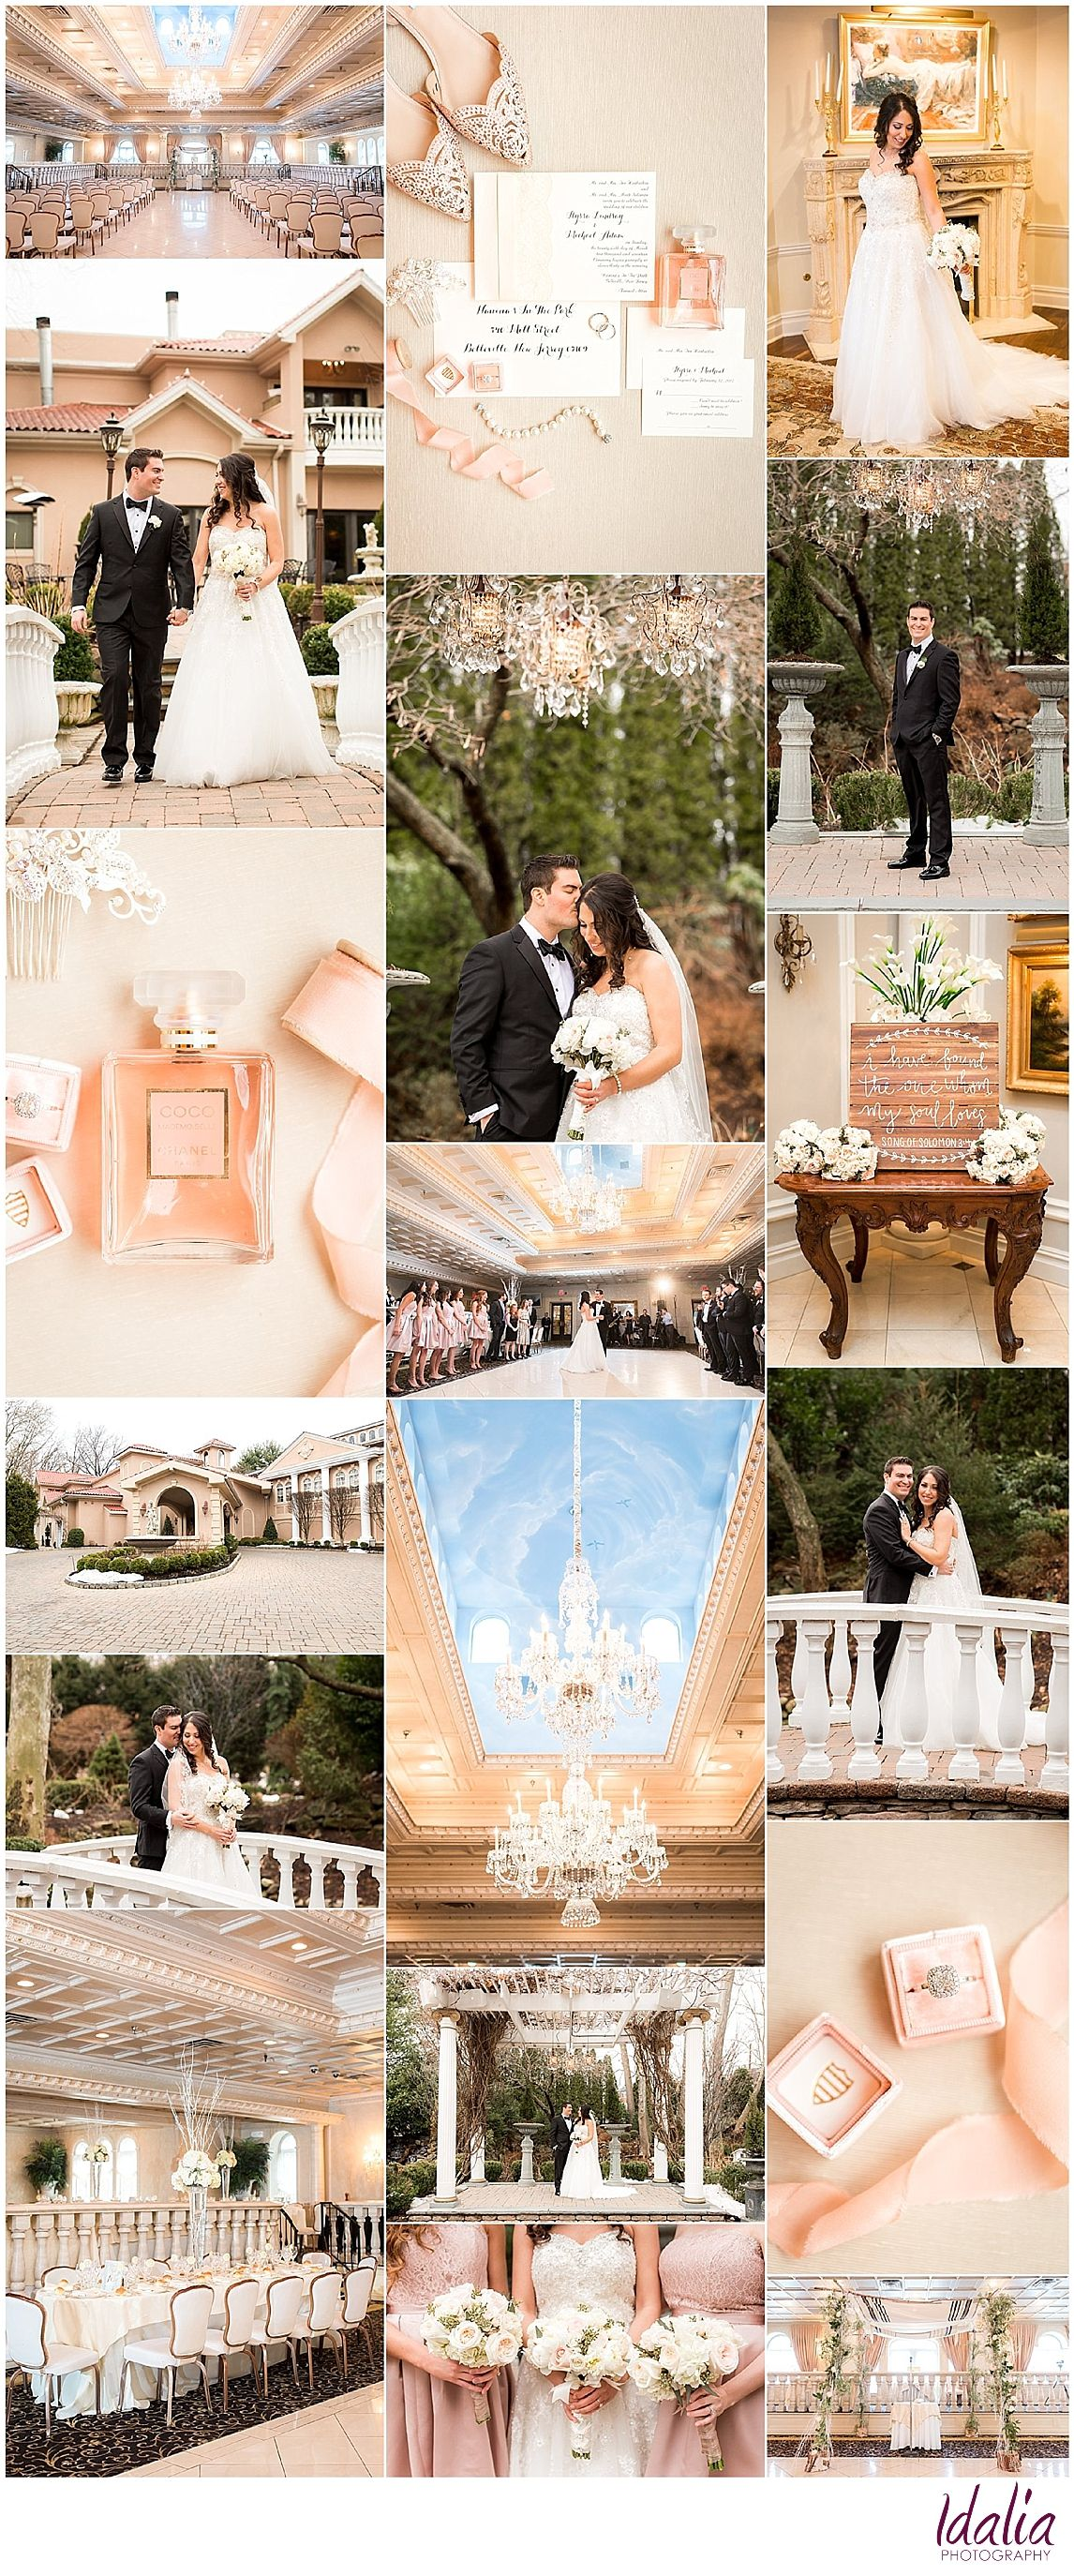 wedding venues asbury park nj%0A Nanina u    s in the Park Wedding Photos   Idalia Photography    Nj Wedding  VenuesWedding